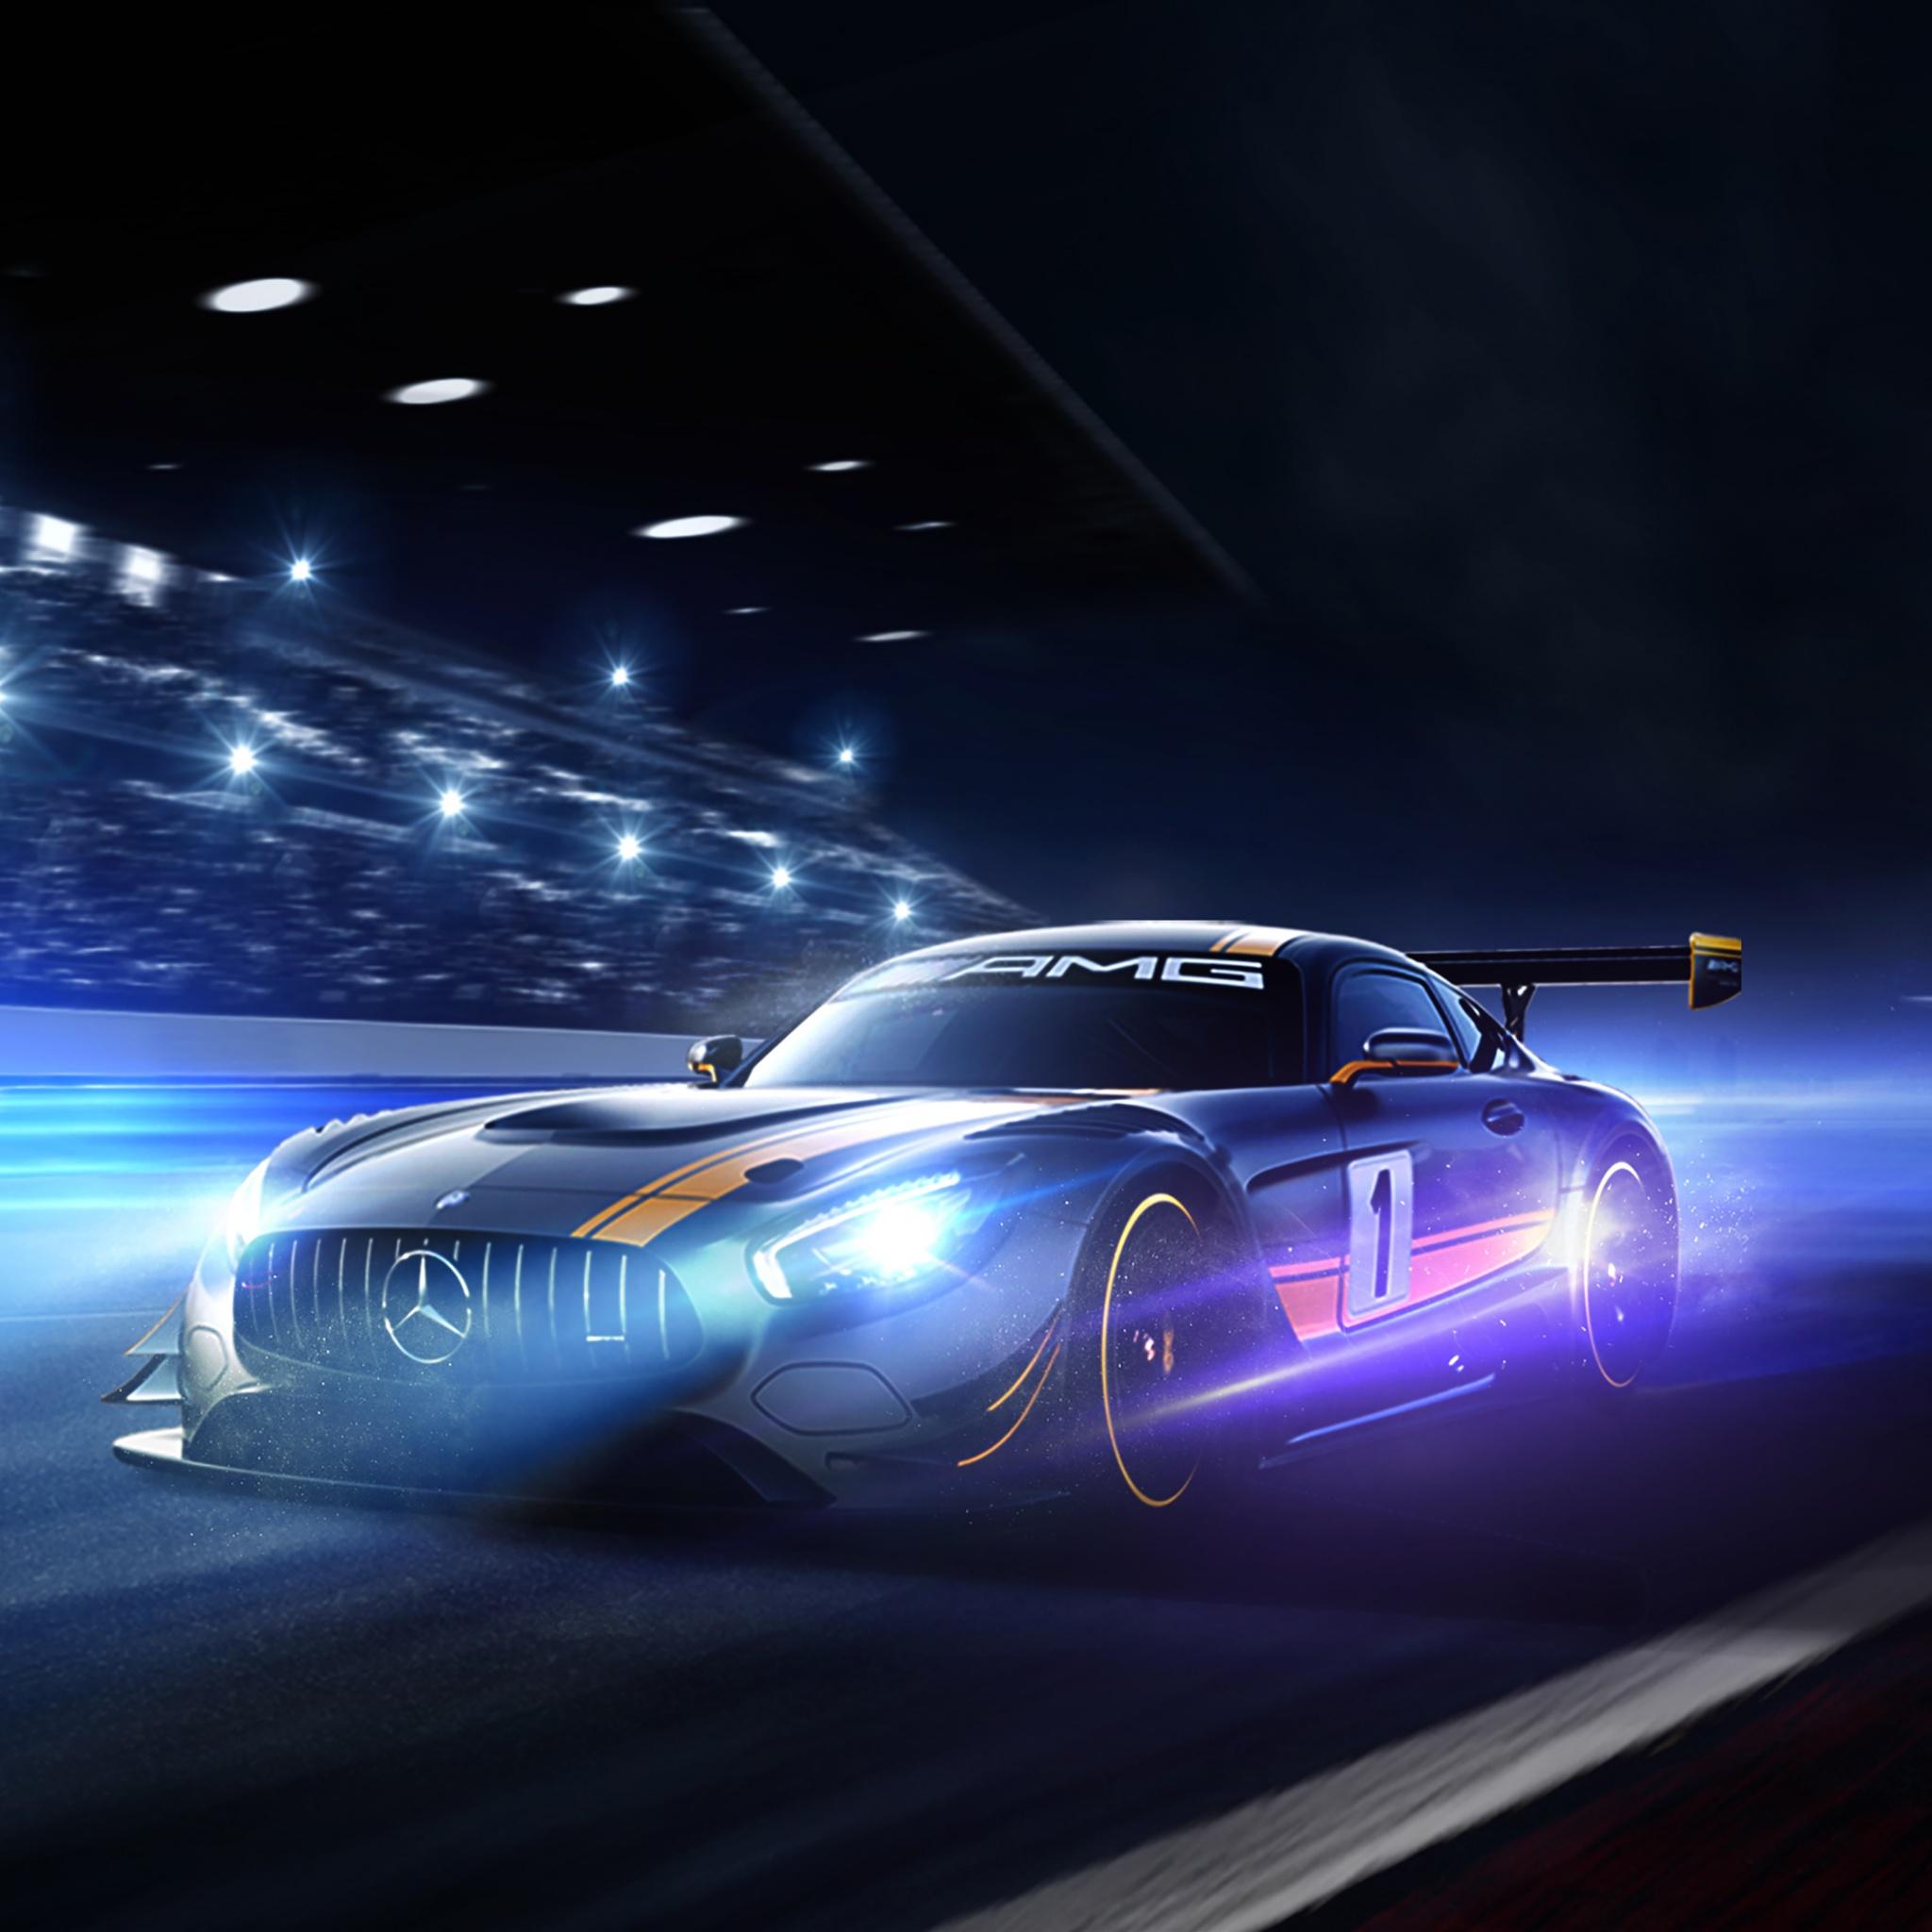 Ferrari F8 Tributo Spyder: Mercedes-AMG GT R 4K Wallpaper, Night, Racing Track, Cars, #97